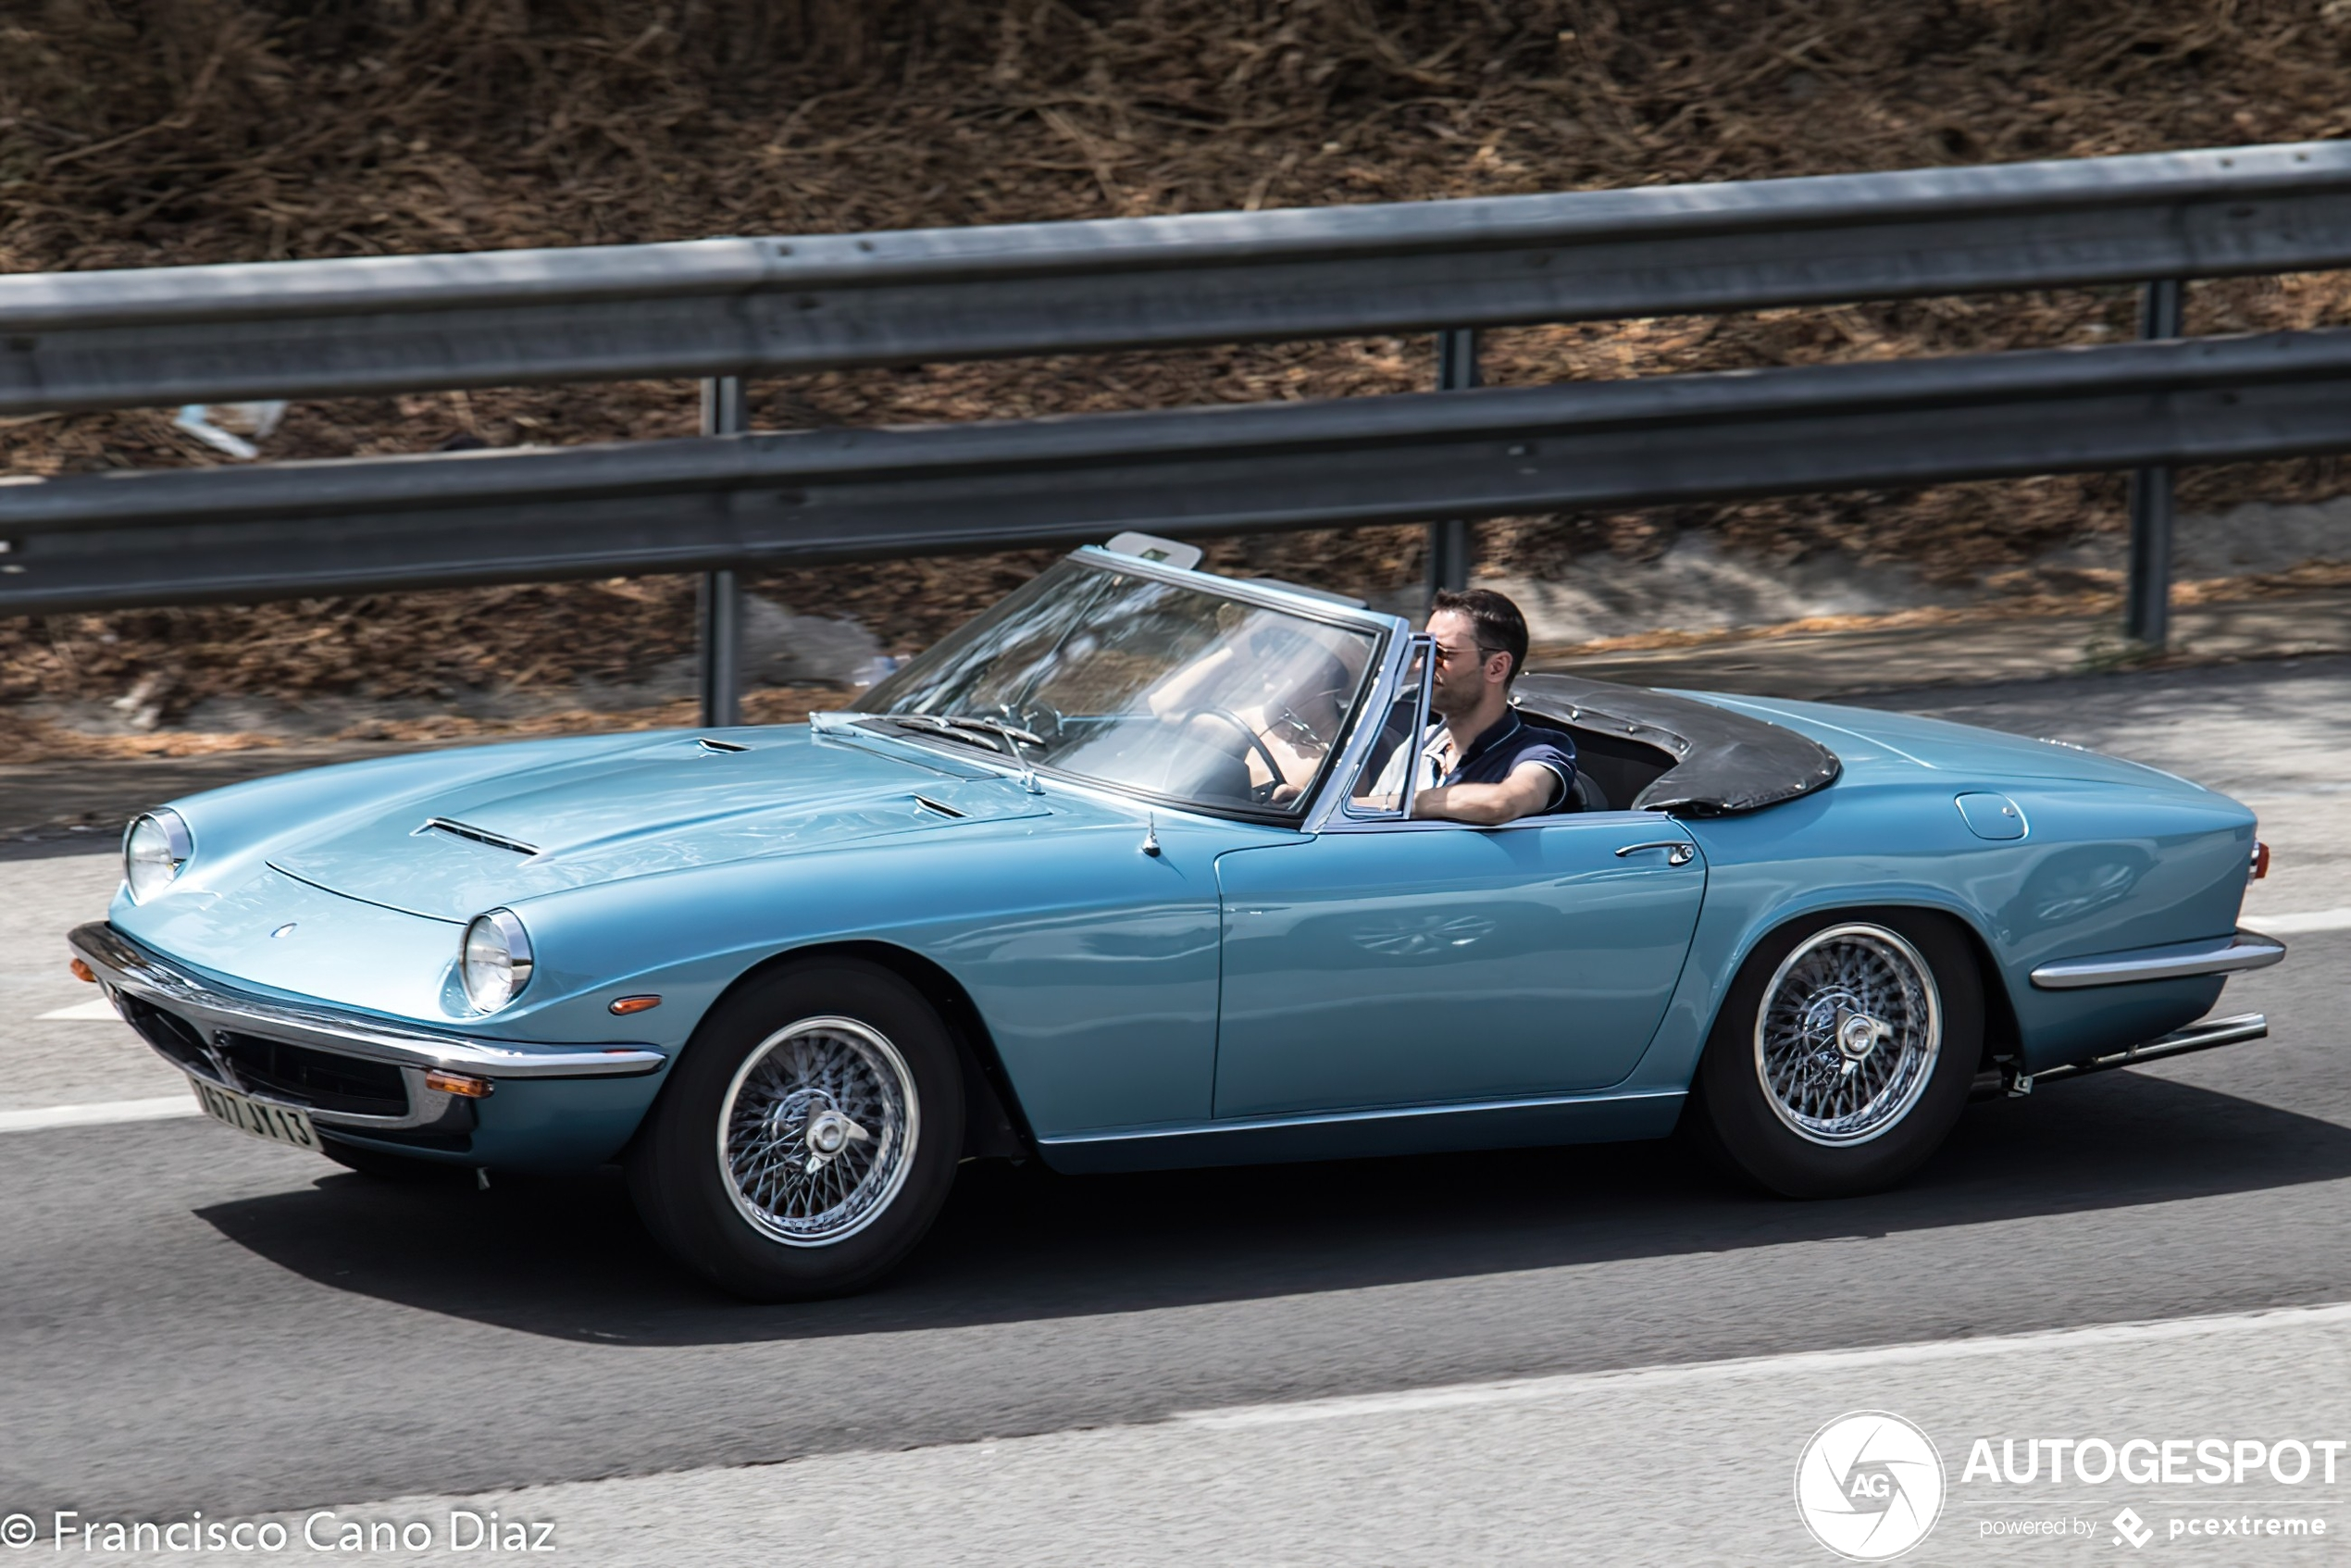 MaseratiMistral 4000 Spyder